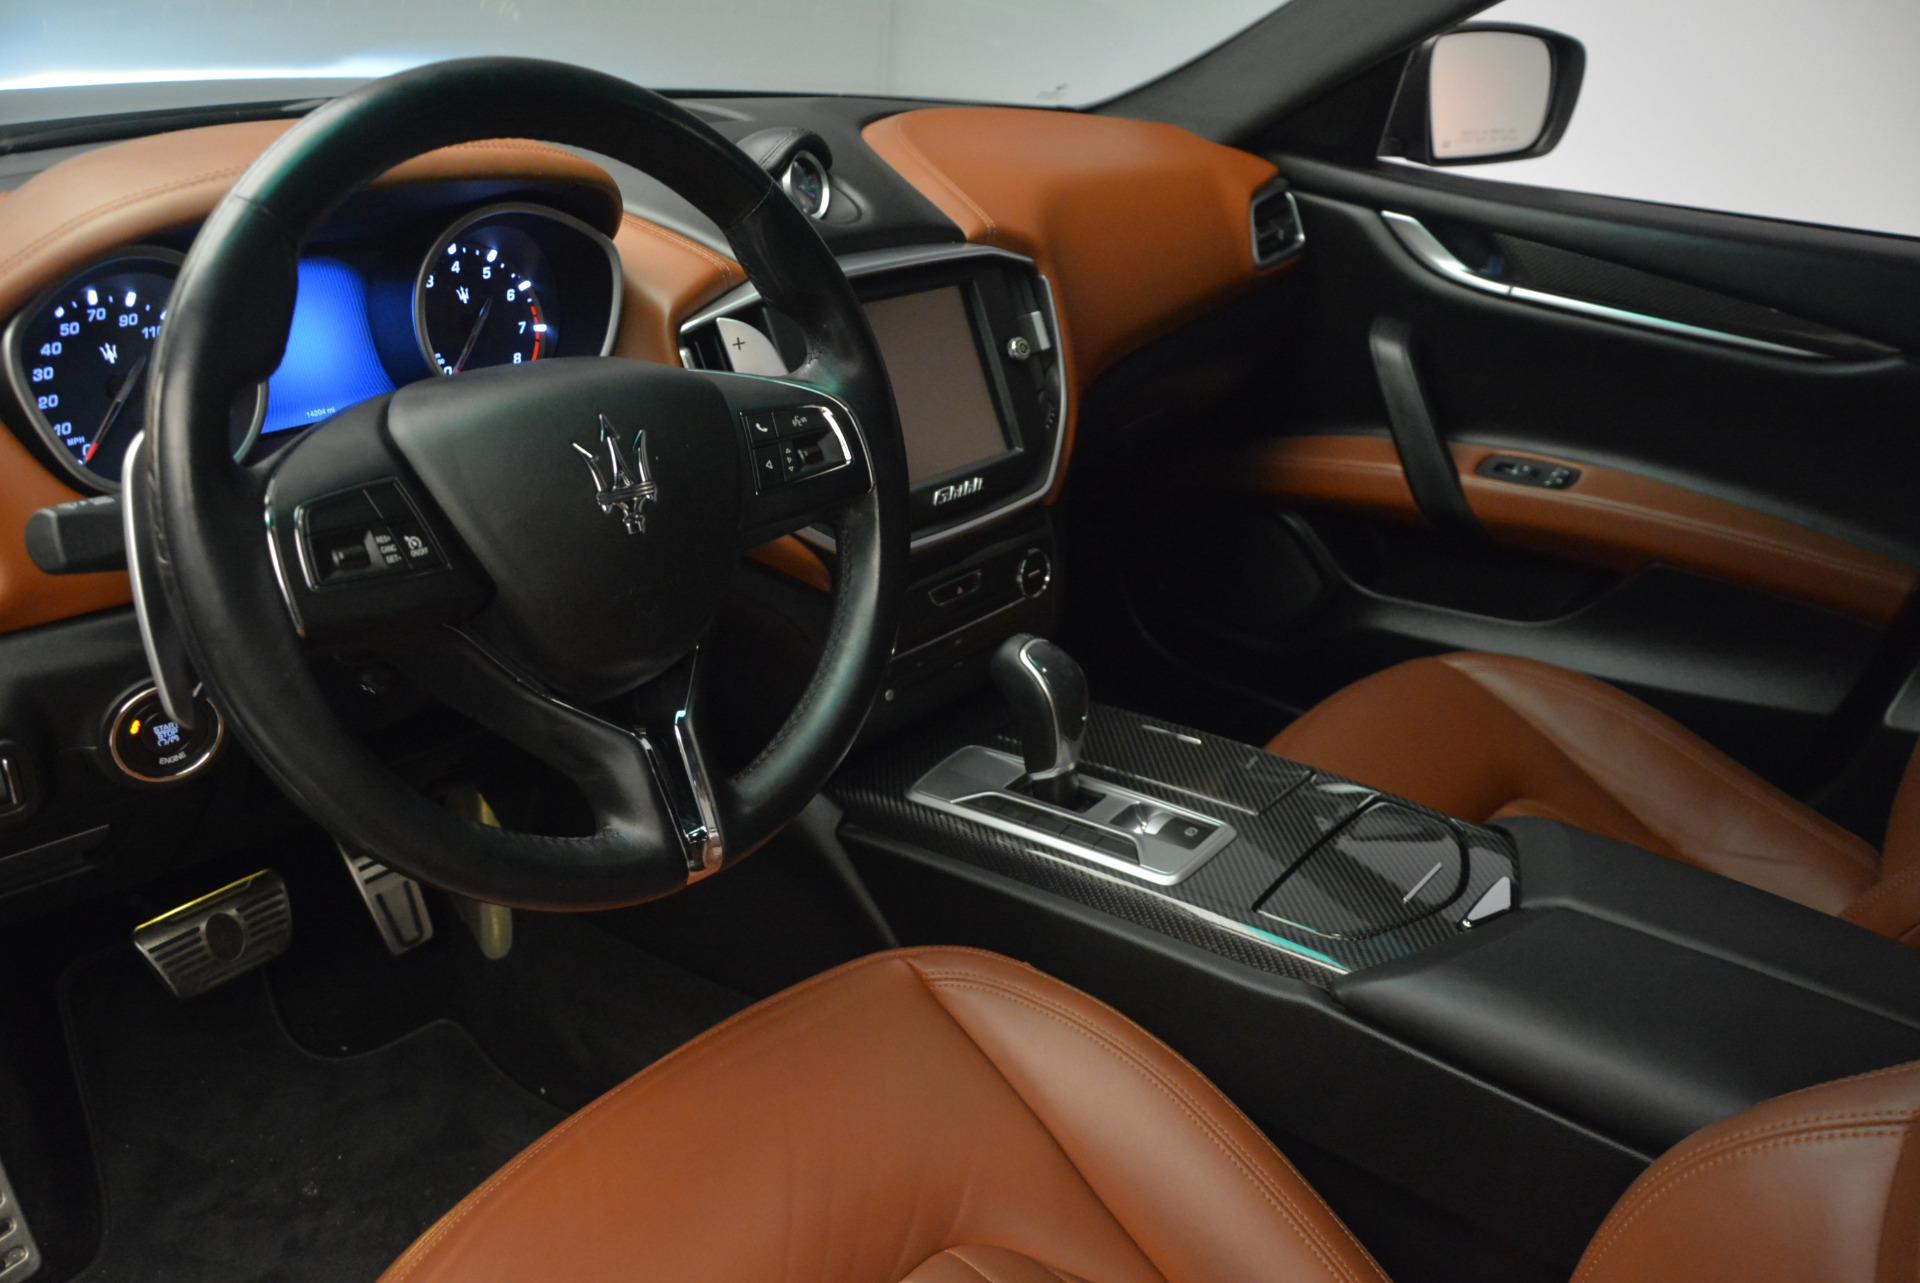 Used 2014 Maserati Ghibli S Q4 For Sale In Greenwich, CT 805_p13